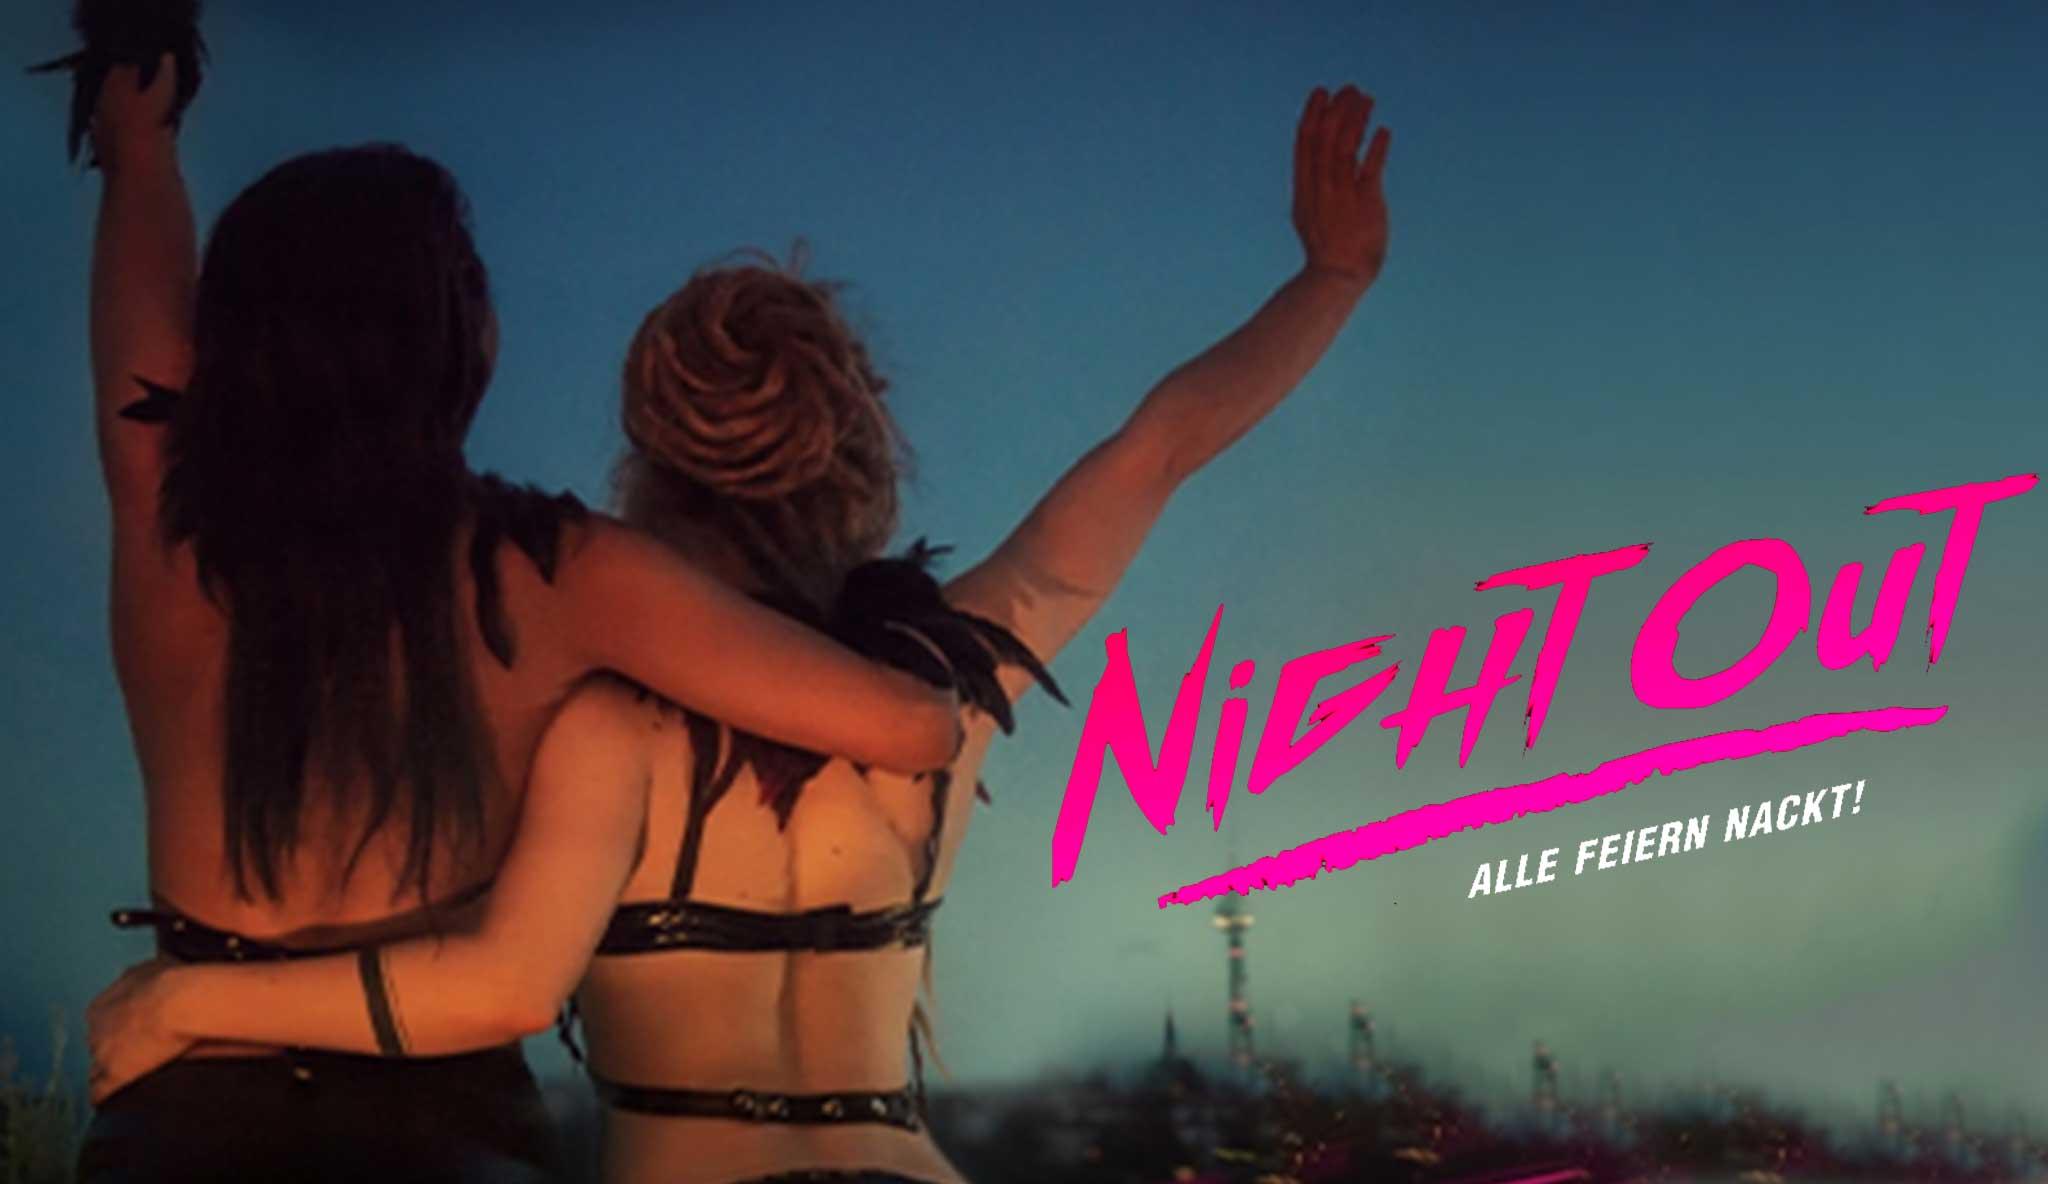 night-out-alle-feiern-nackt\header.jpg